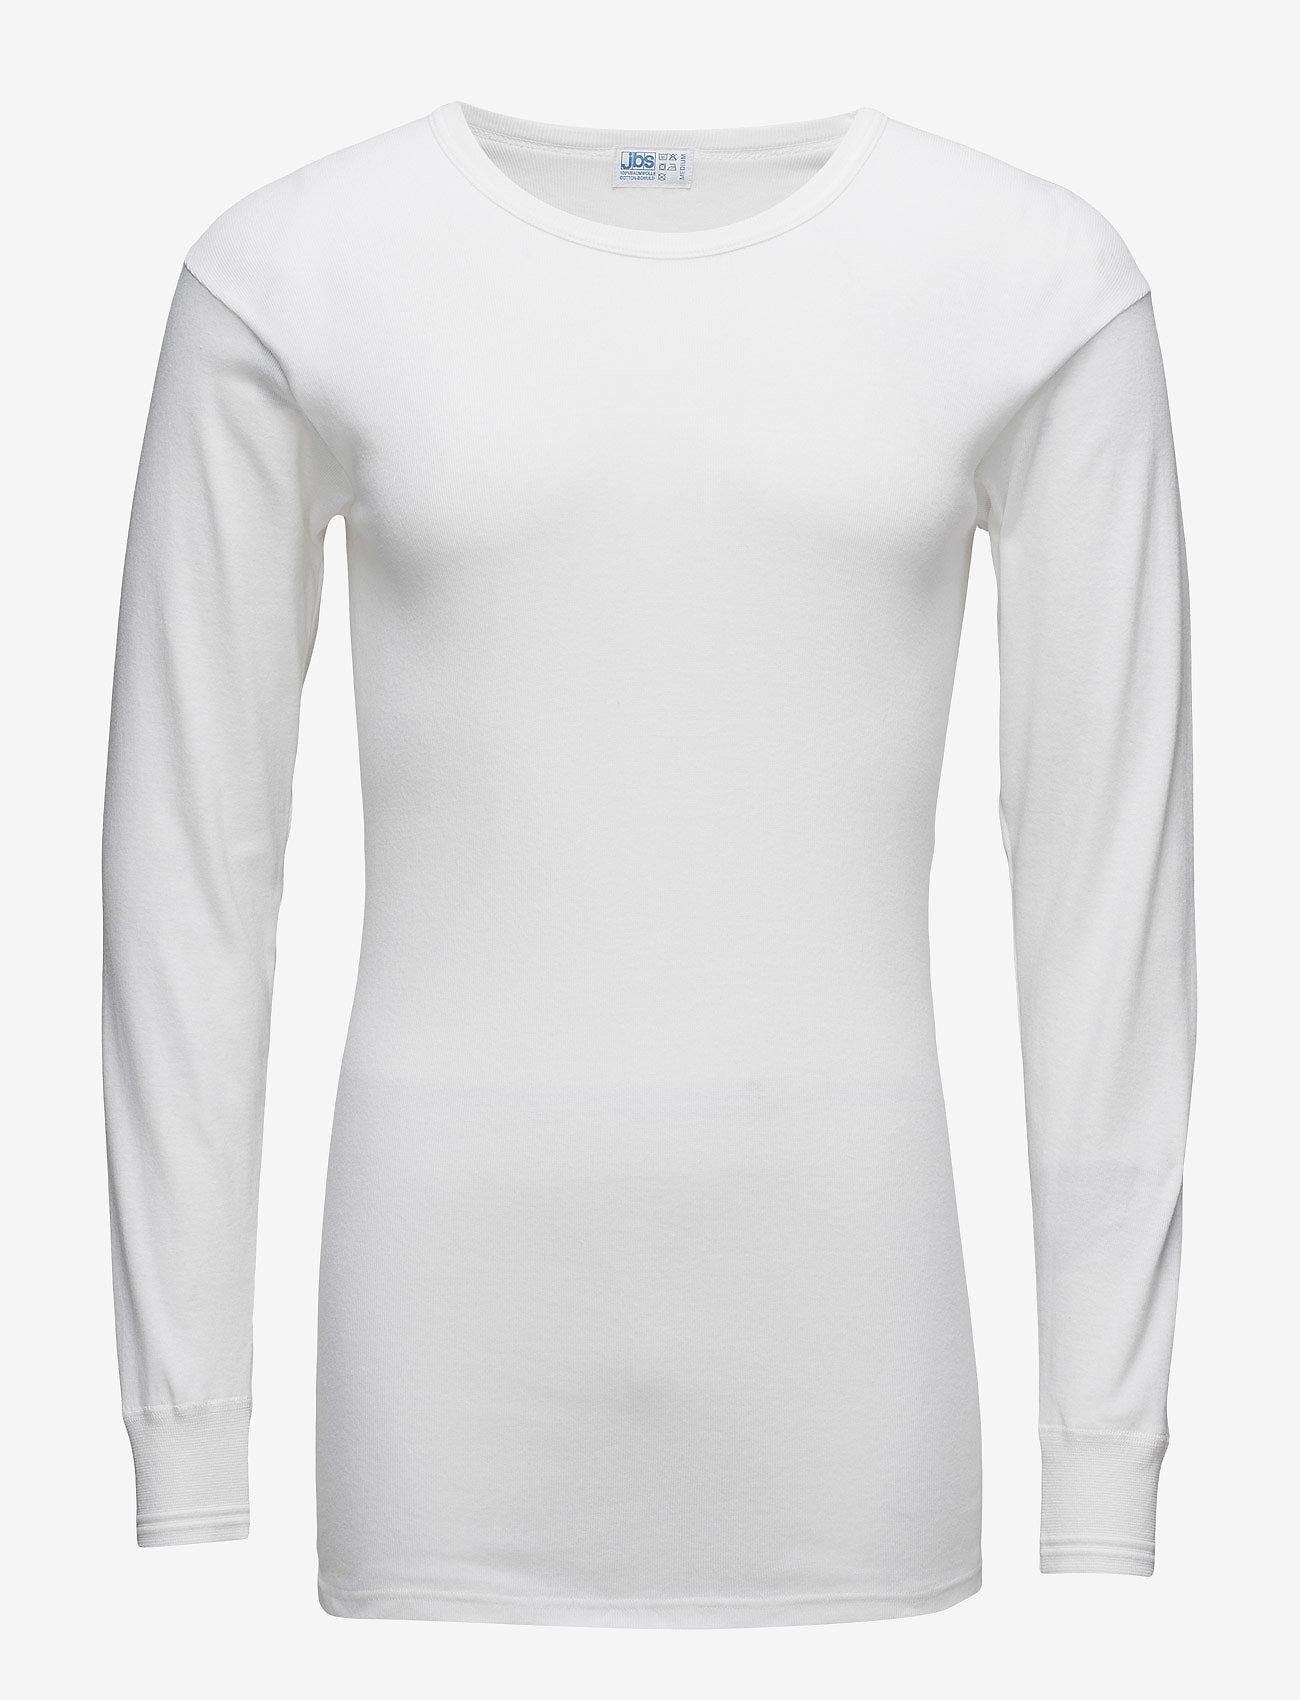 JBS - Original longsleeve - basic t-shirts - white